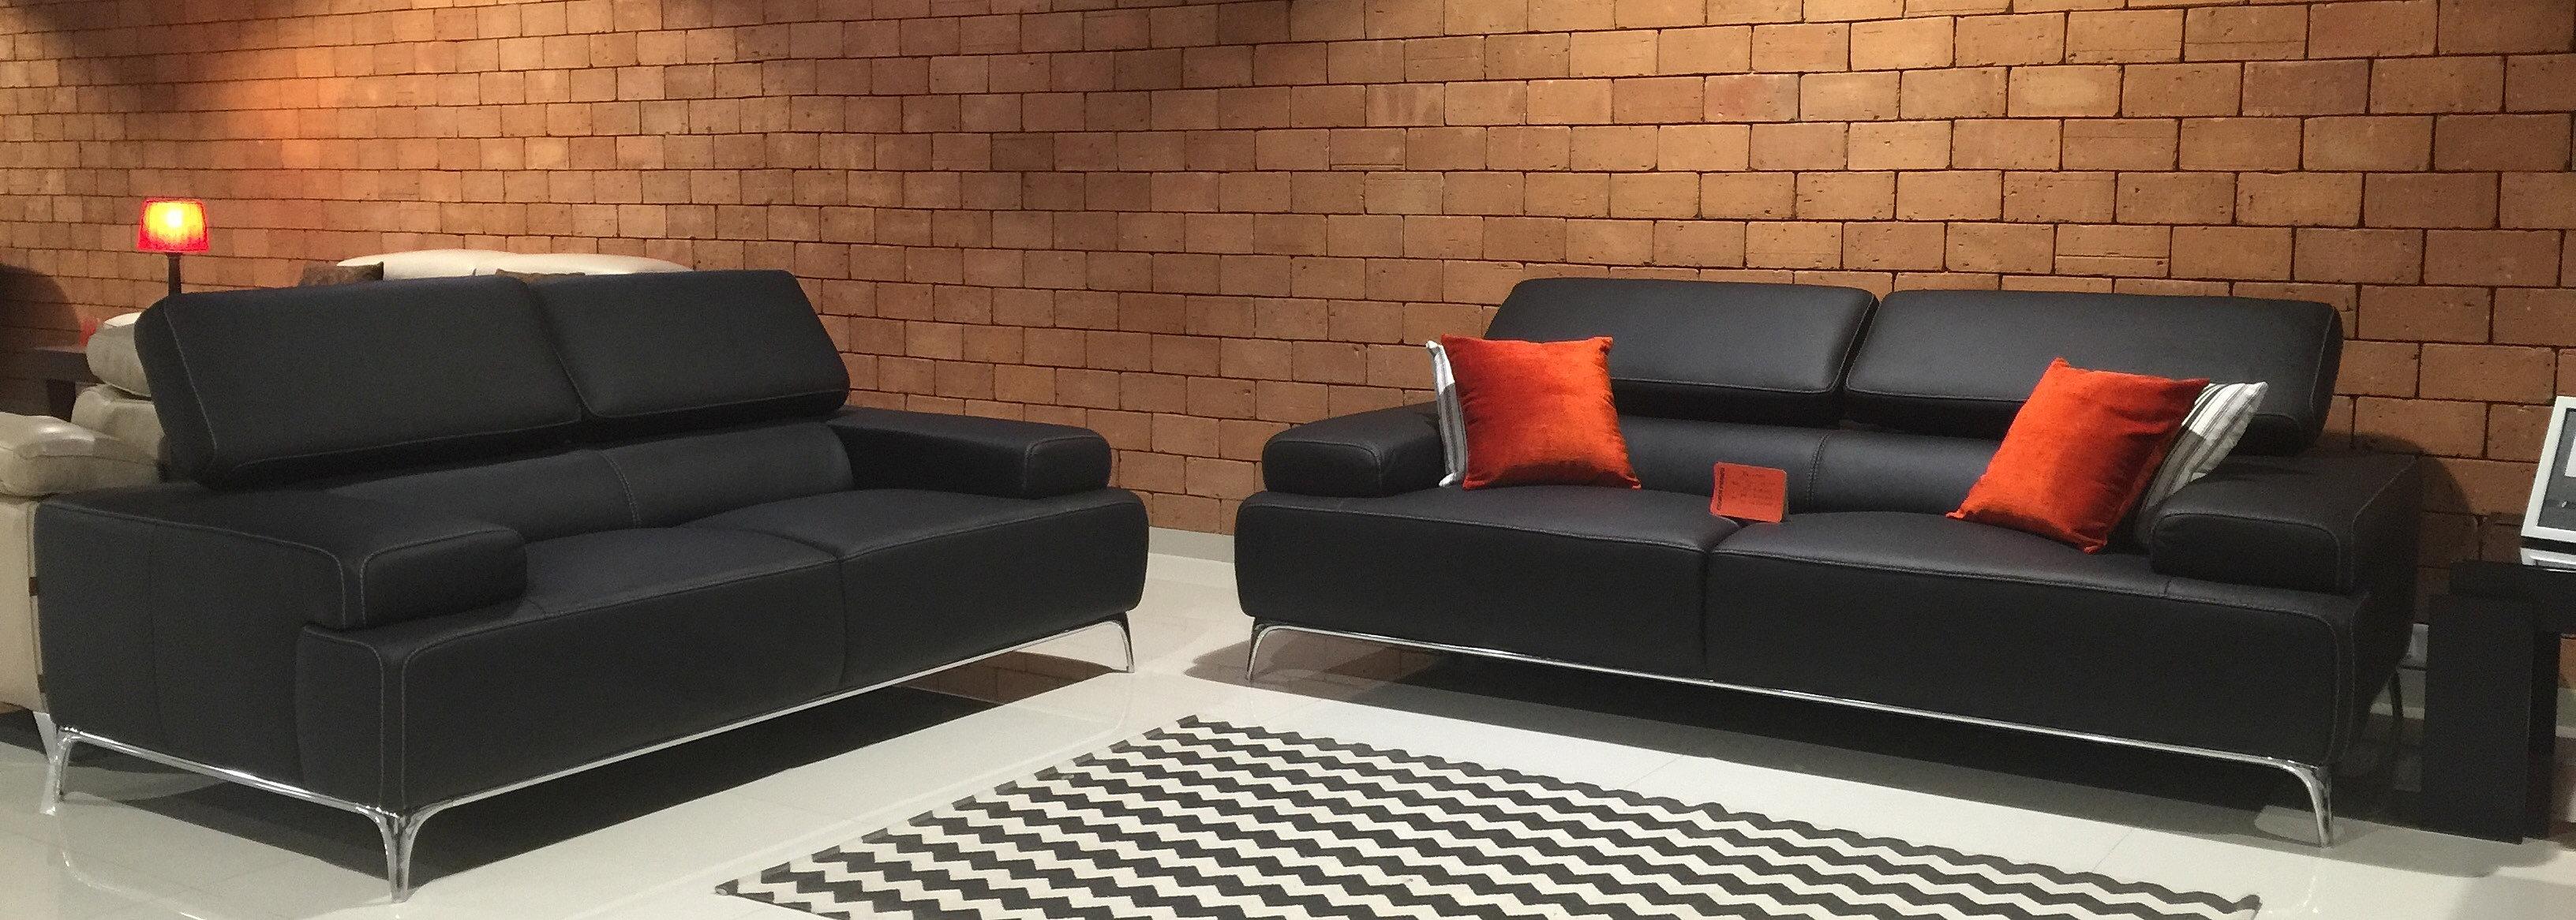 3 2 leather sofa deals - Valerian 3 2 1 Leather Sofa